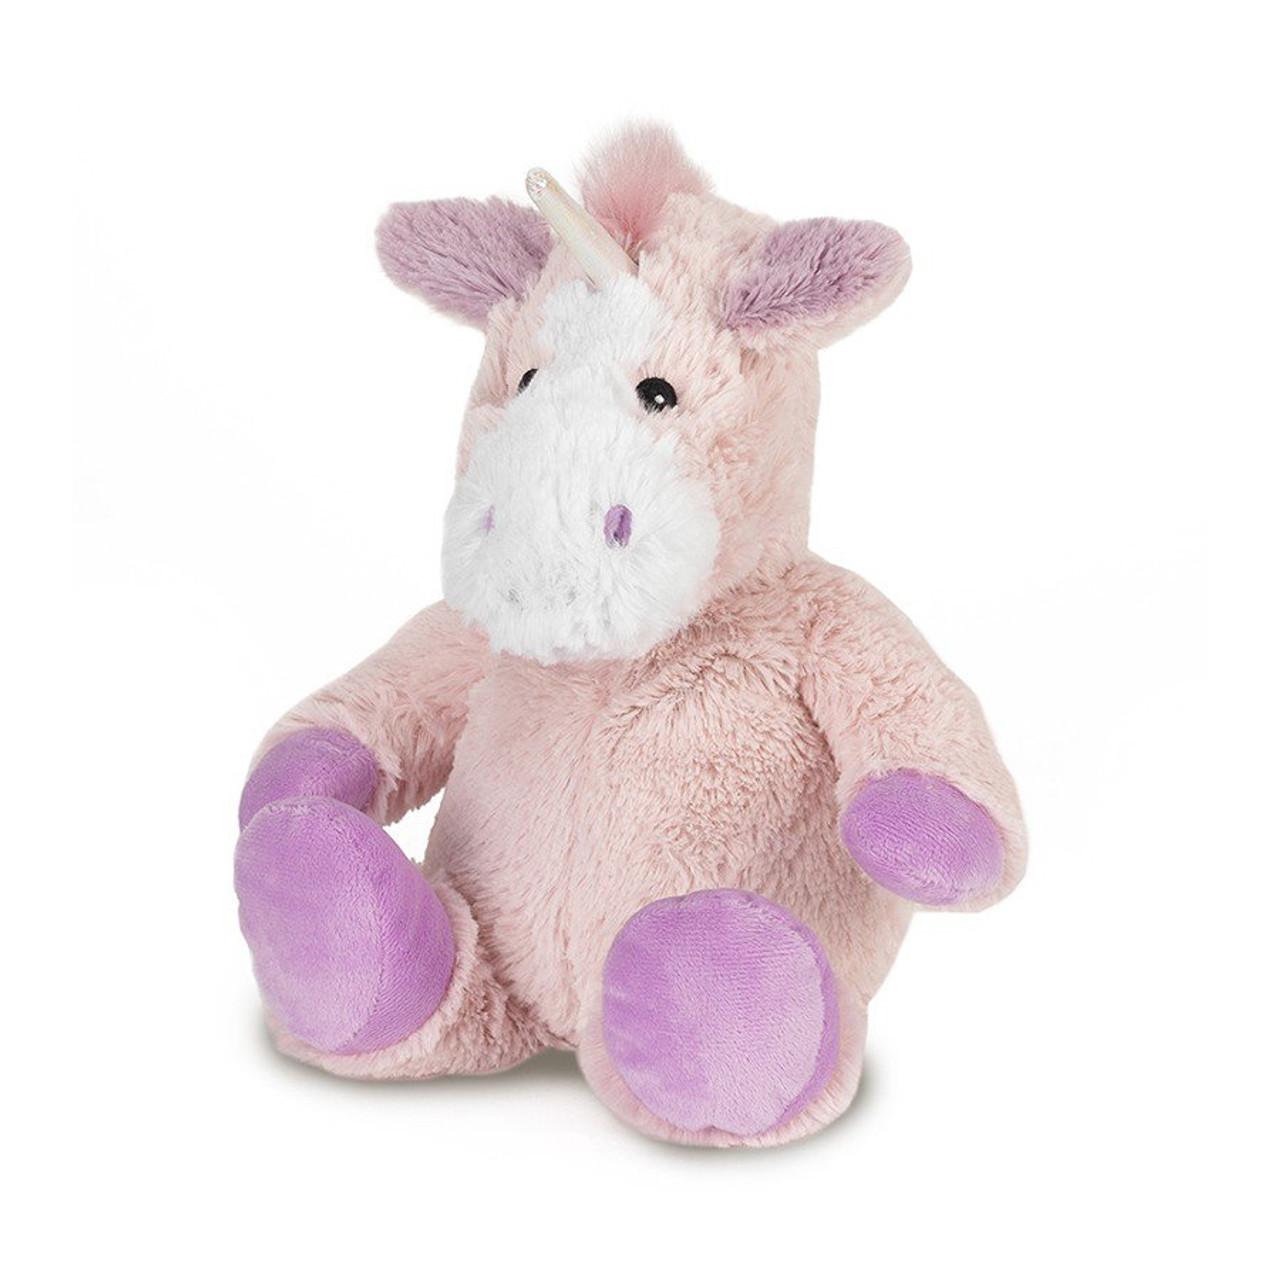 3b778fa6767 Warmies Cozy Plush Animals- Heatable Stuffed Toys